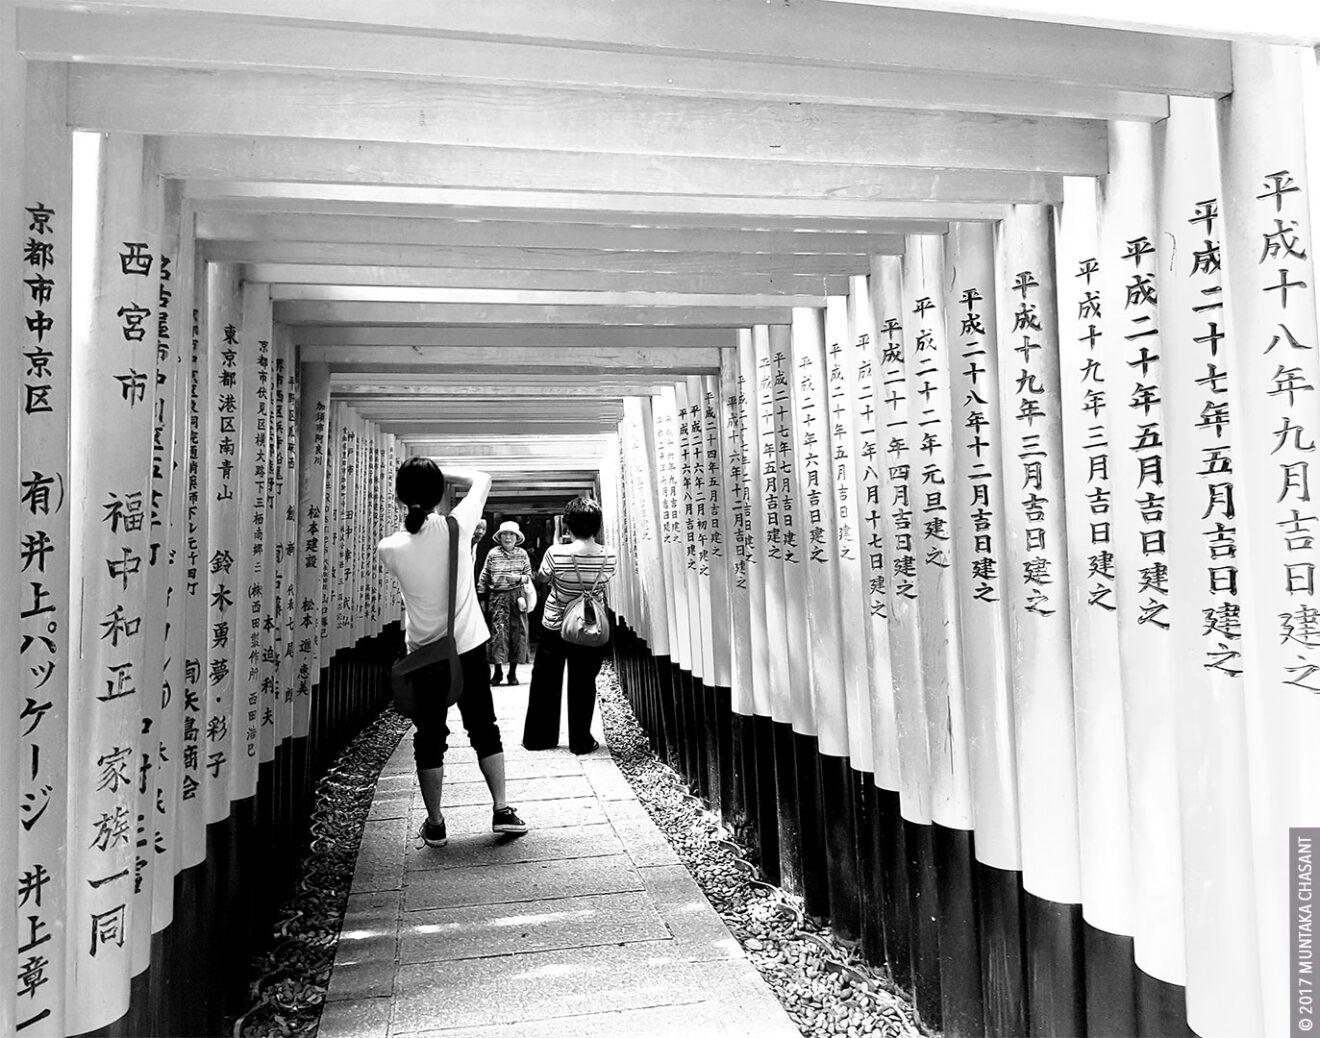 Fushimi Inari, Kyoto, Japan, Photo by Muntaka Chasant